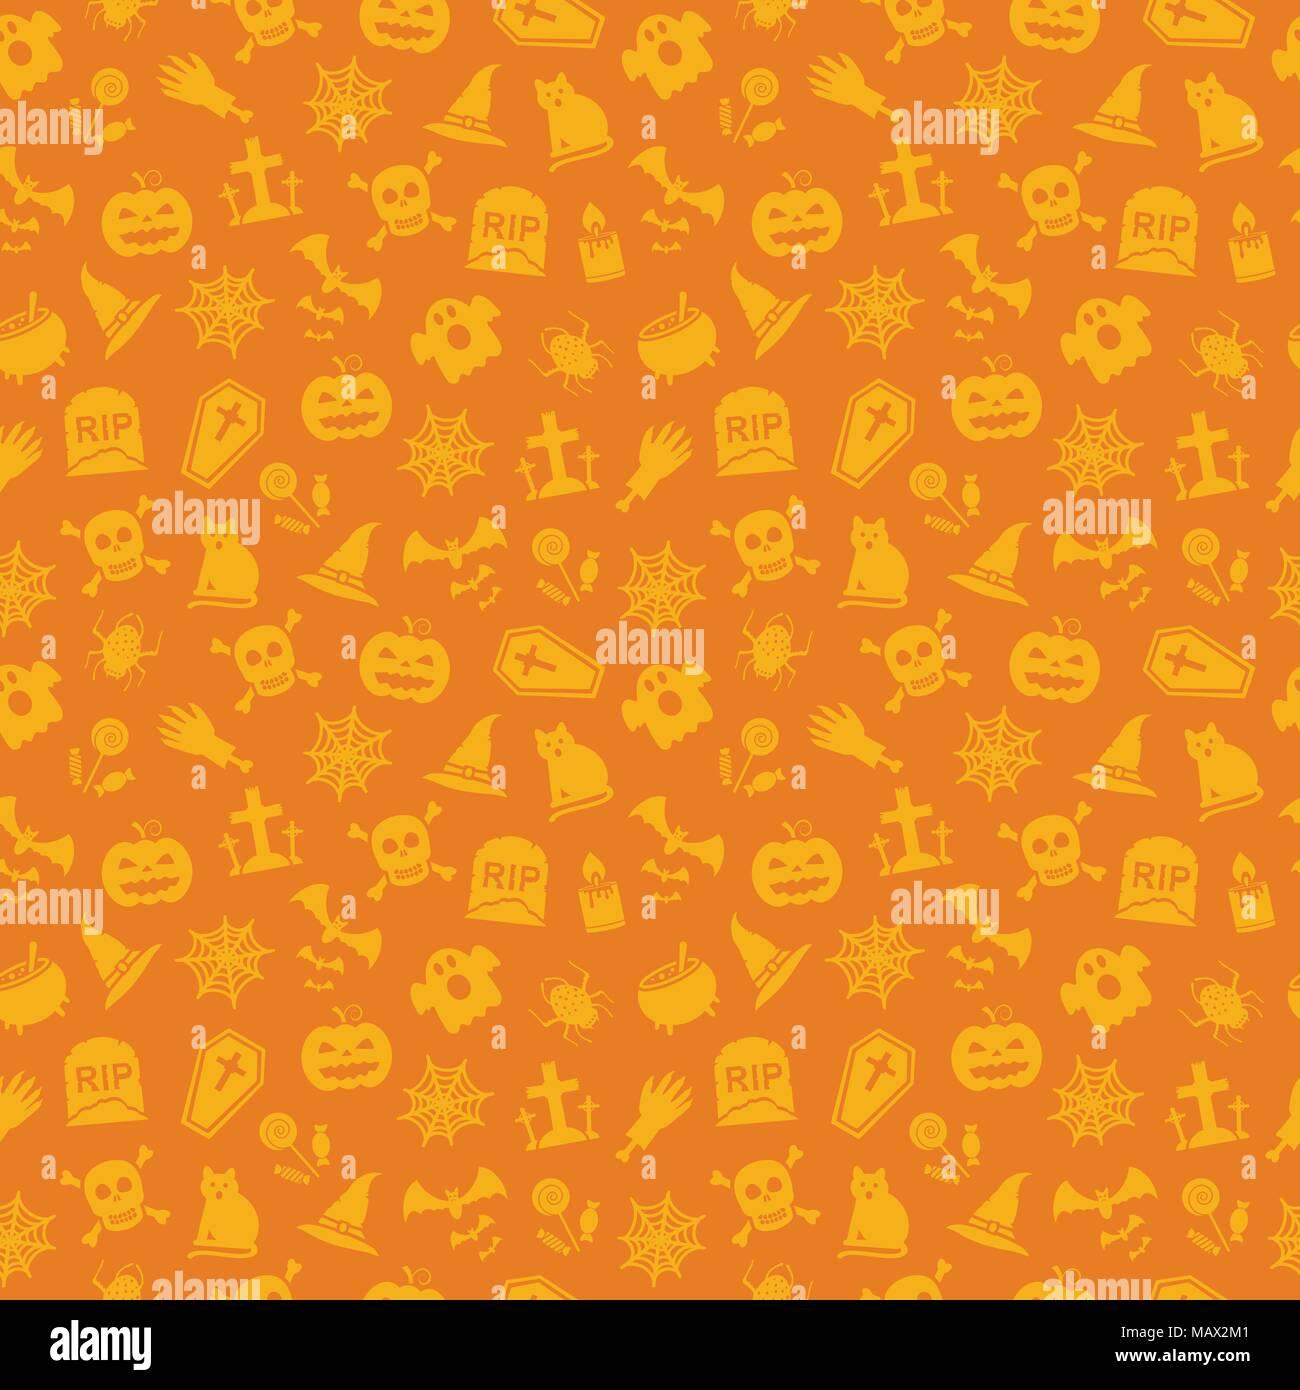 Halloween Email Background.Halloween Orange Background Seamless Pattern Vector Illustration Stock Vector Image Art Alamy